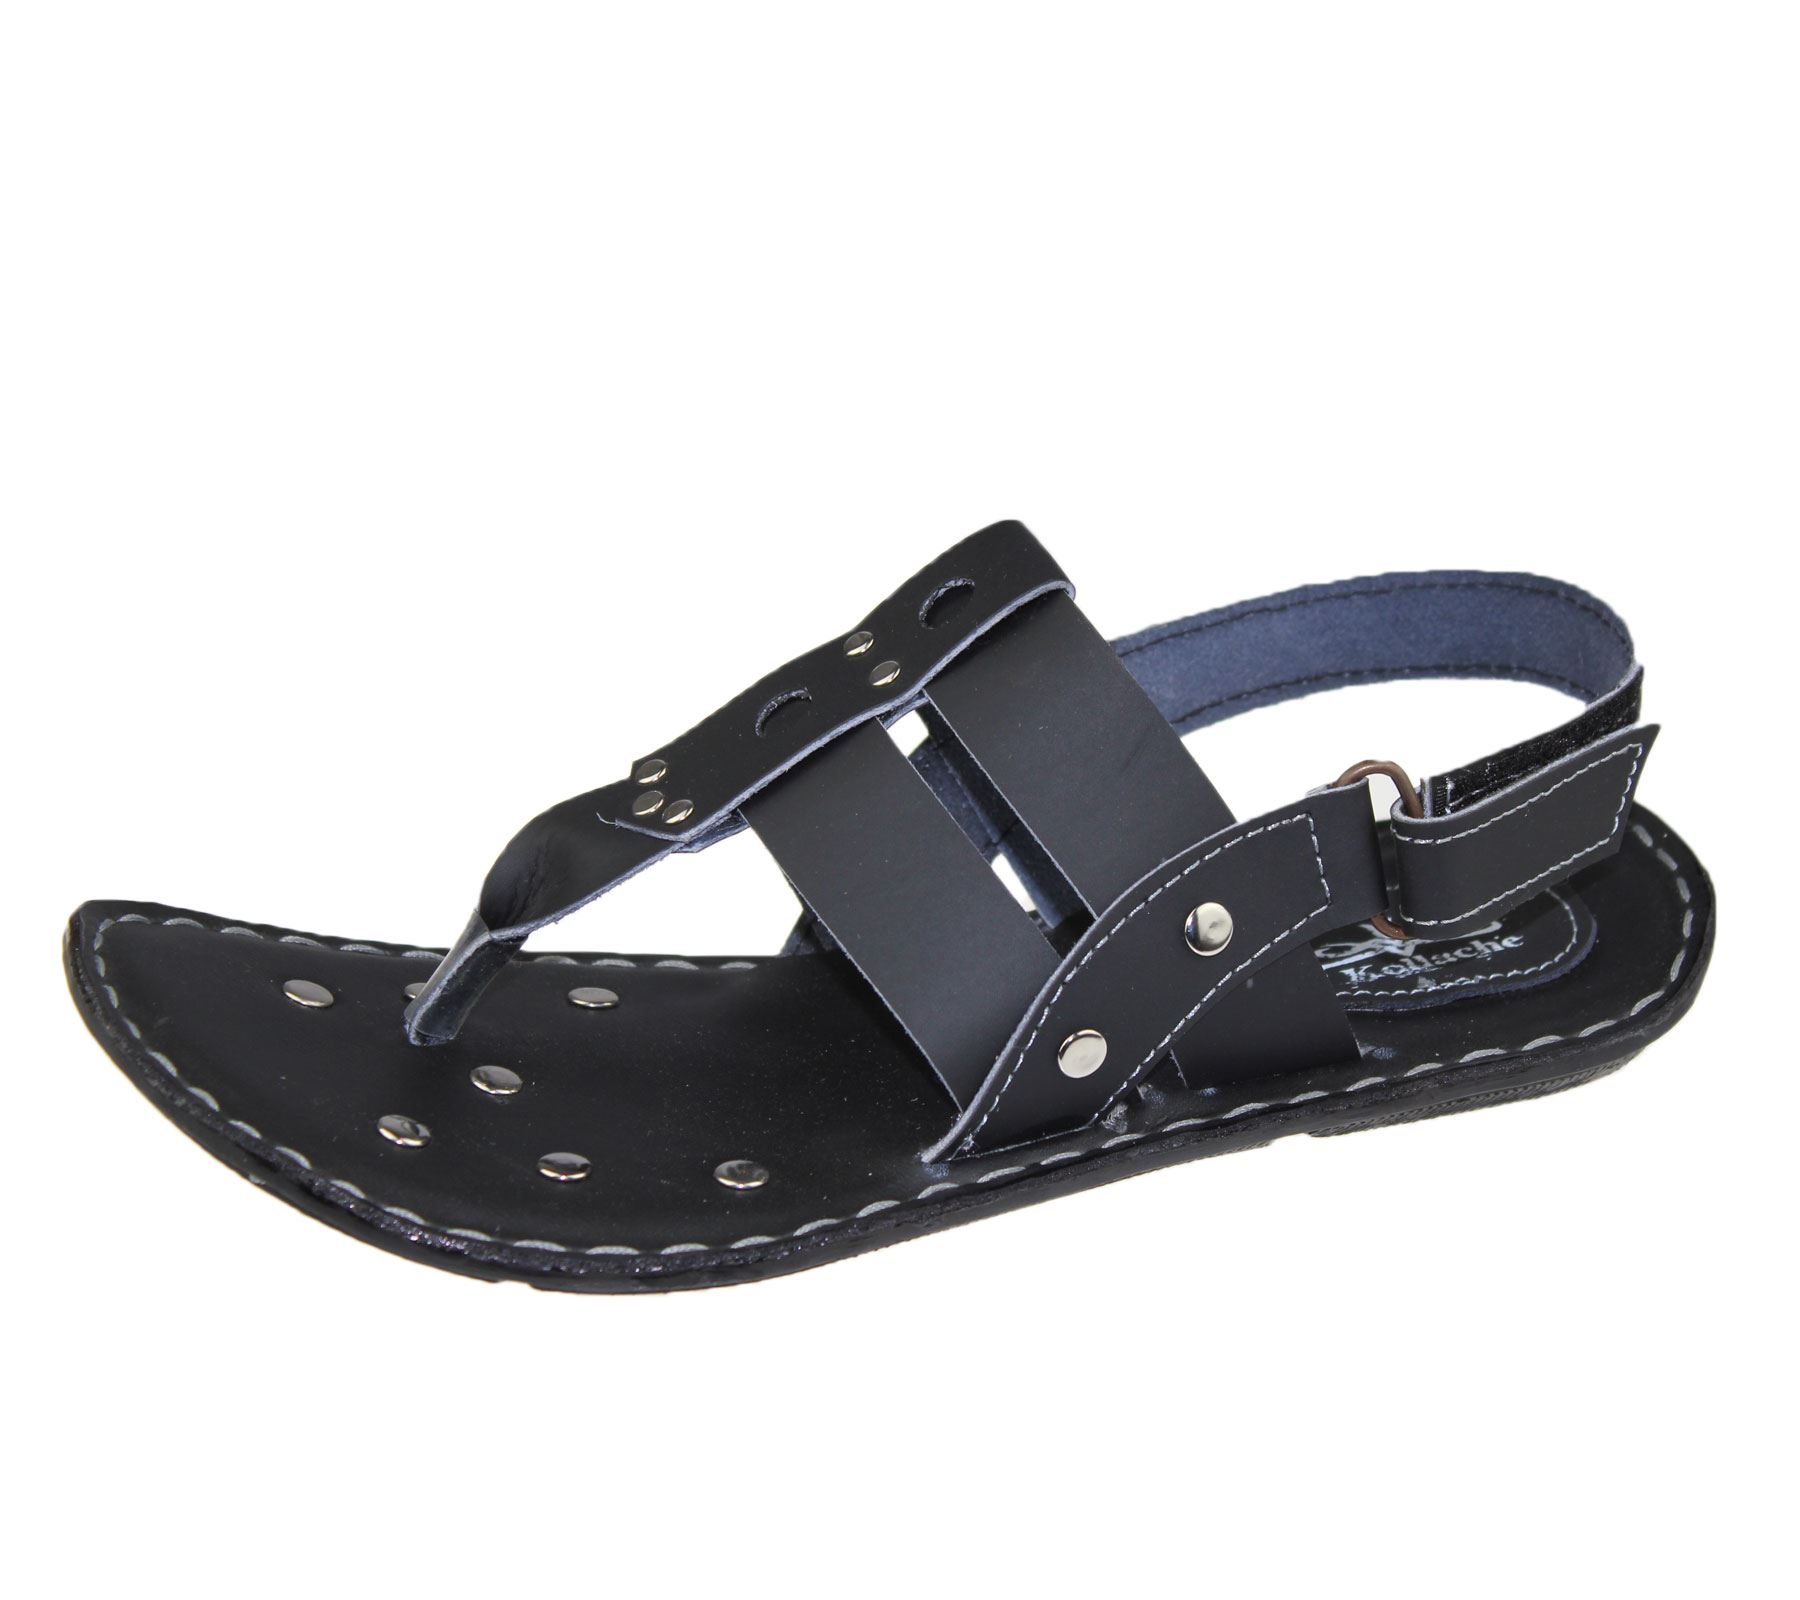 mens sandals summer casual beach walking beach slipper. Black Bedroom Furniture Sets. Home Design Ideas